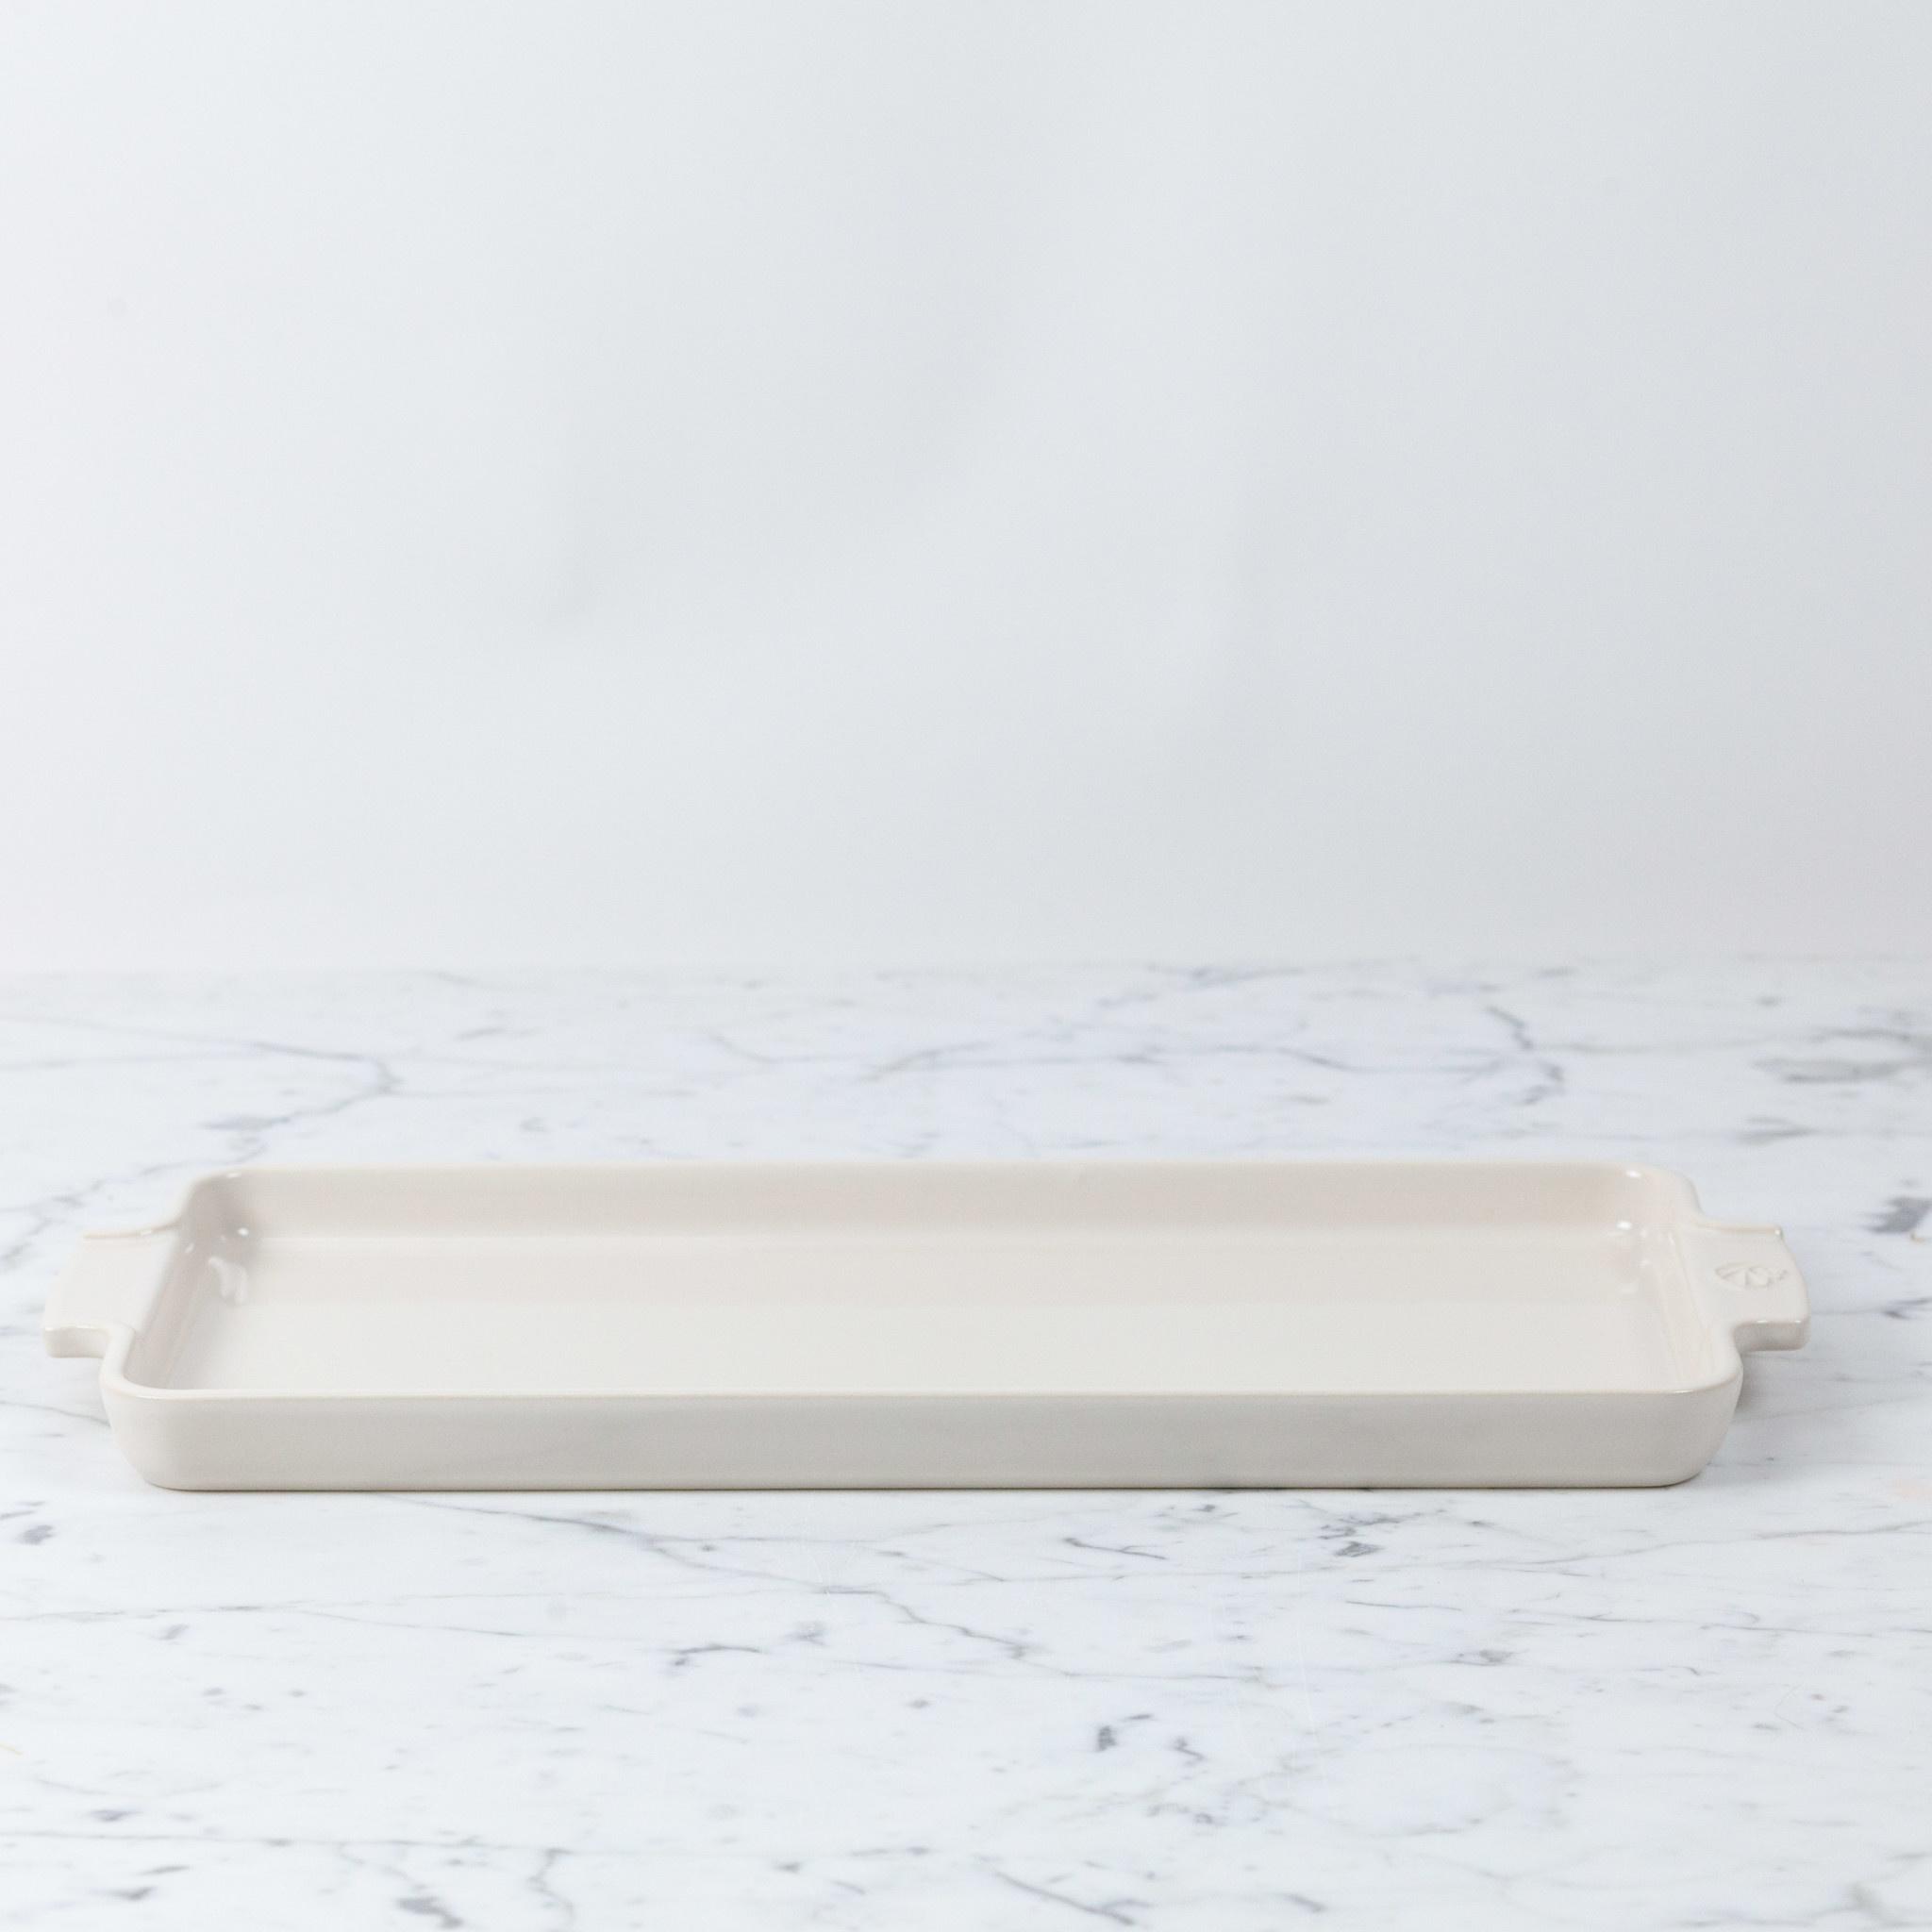 Peugeot Pepper Mills Peugeot Appolia Appetizer Baking Platter - Ecru